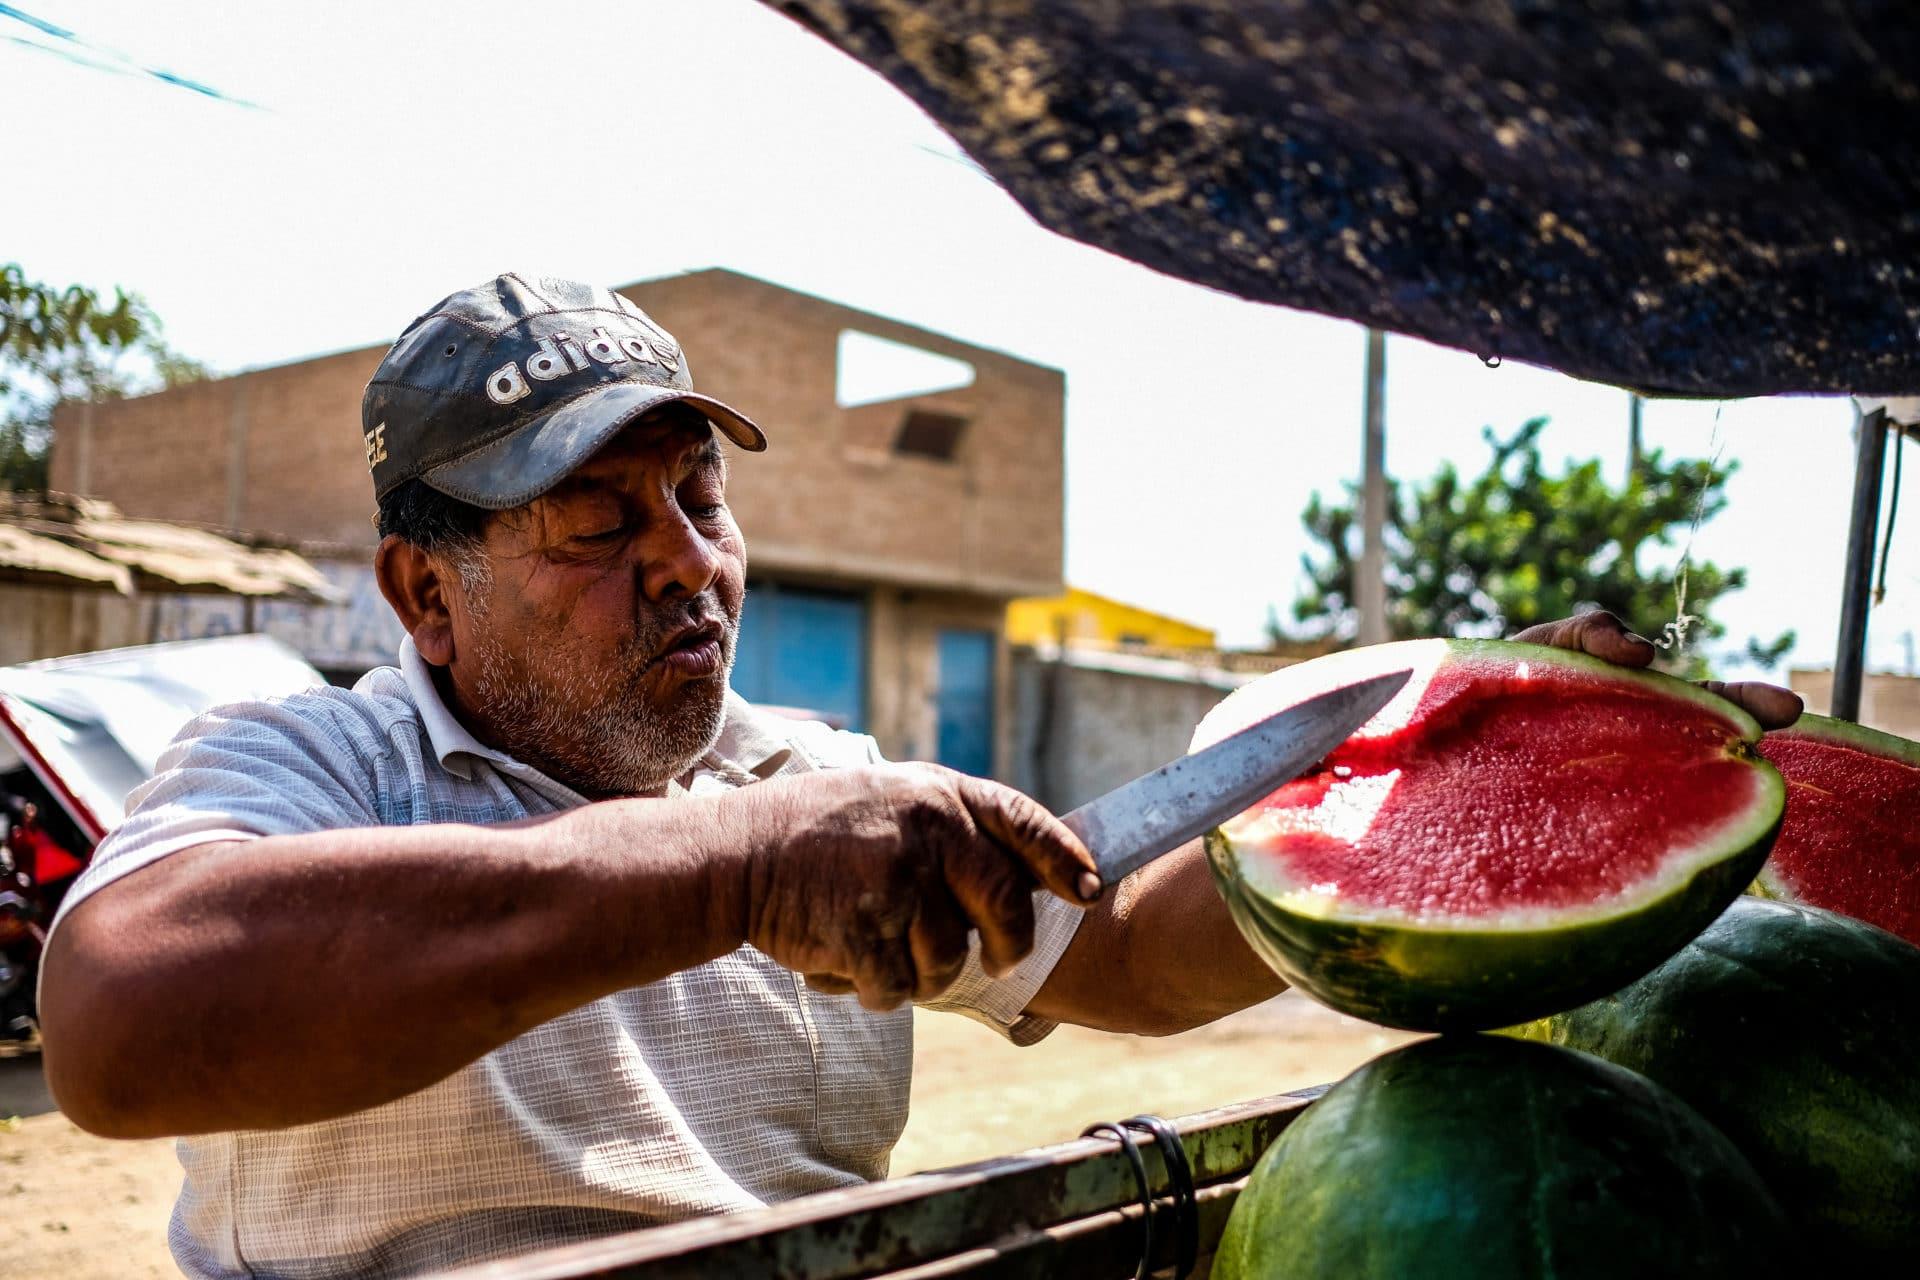 Man Cutting Watermellon-2